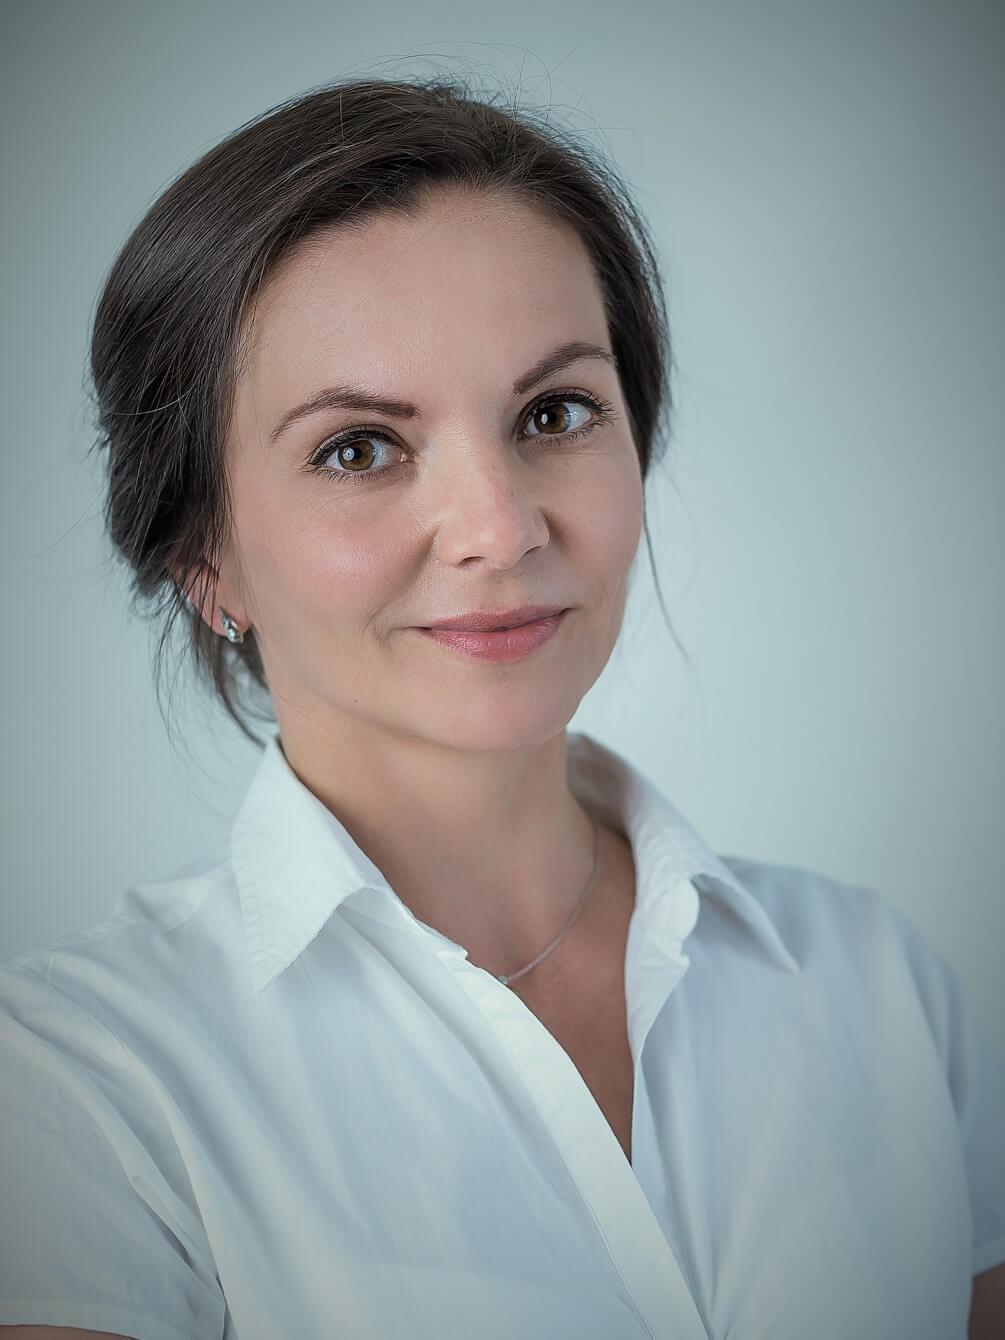 Klaudia Teresińska